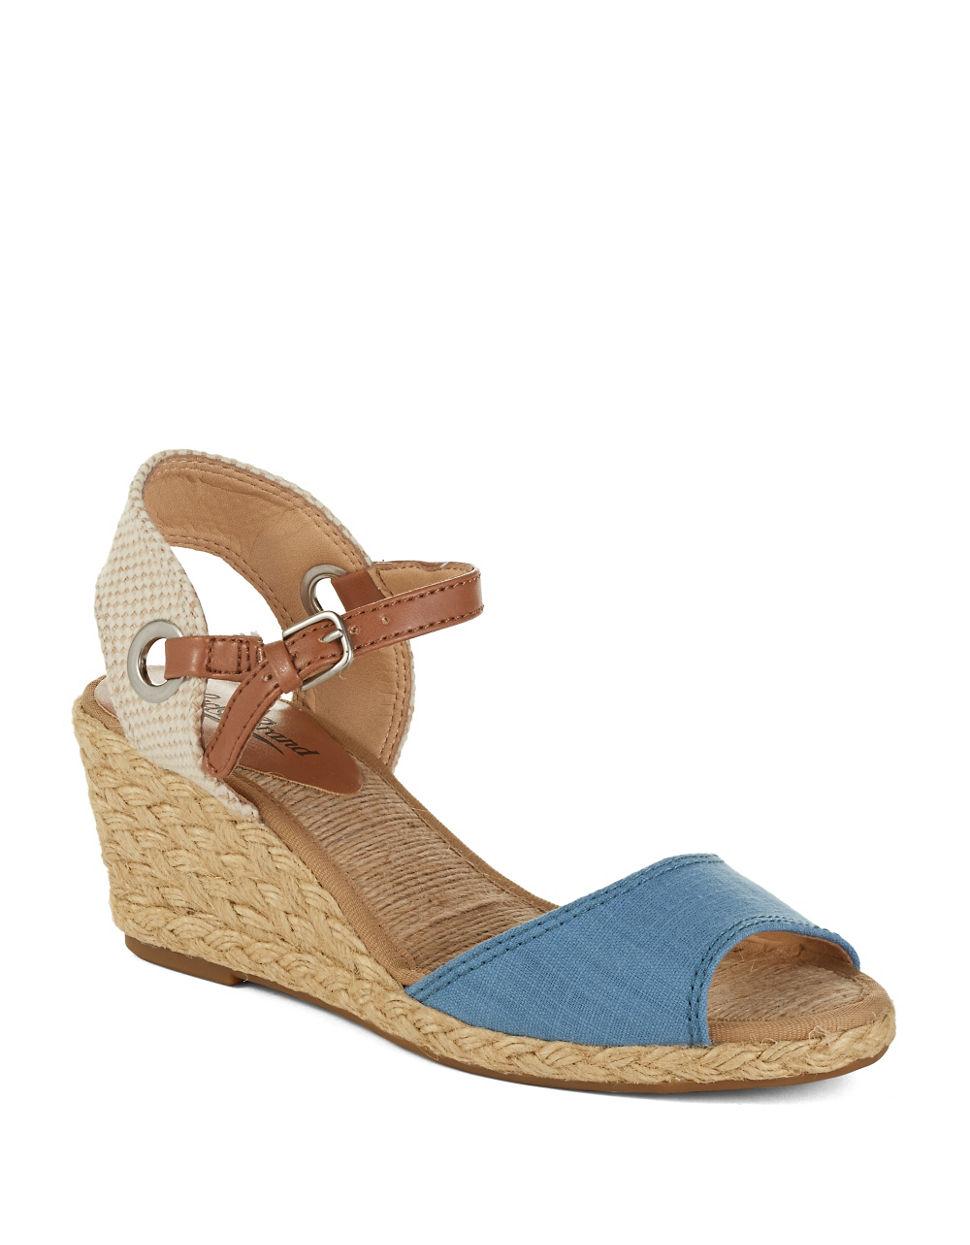 lucky brand kyndra wedge sandals in blue light blue lyst